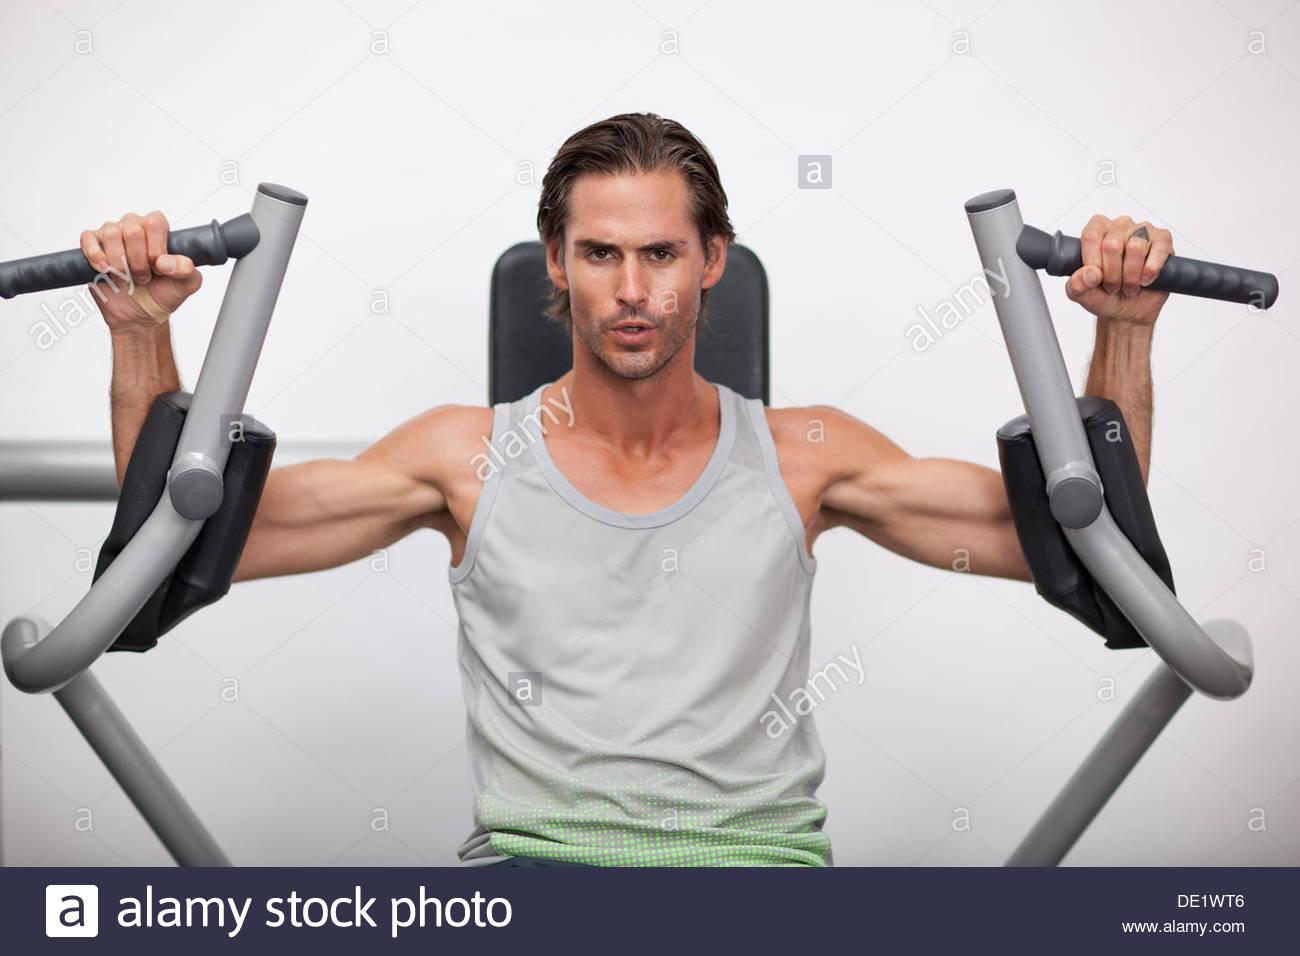 Portrait of man using exercise equipment in gymnasium - Stock Image